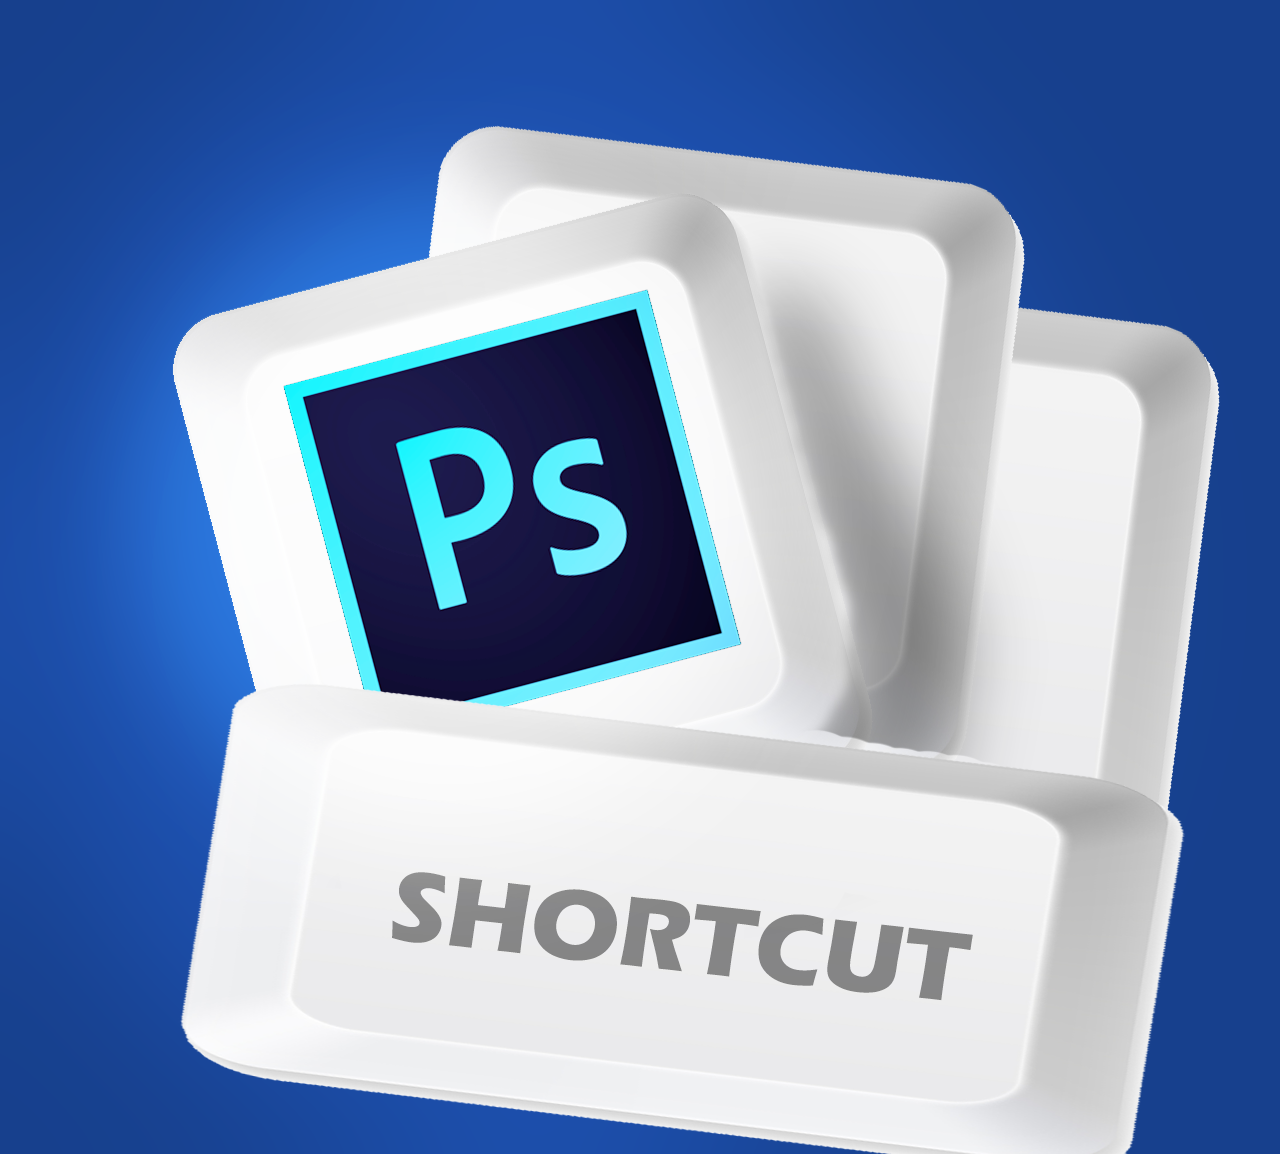 keyboard shortcut photoshop, ps